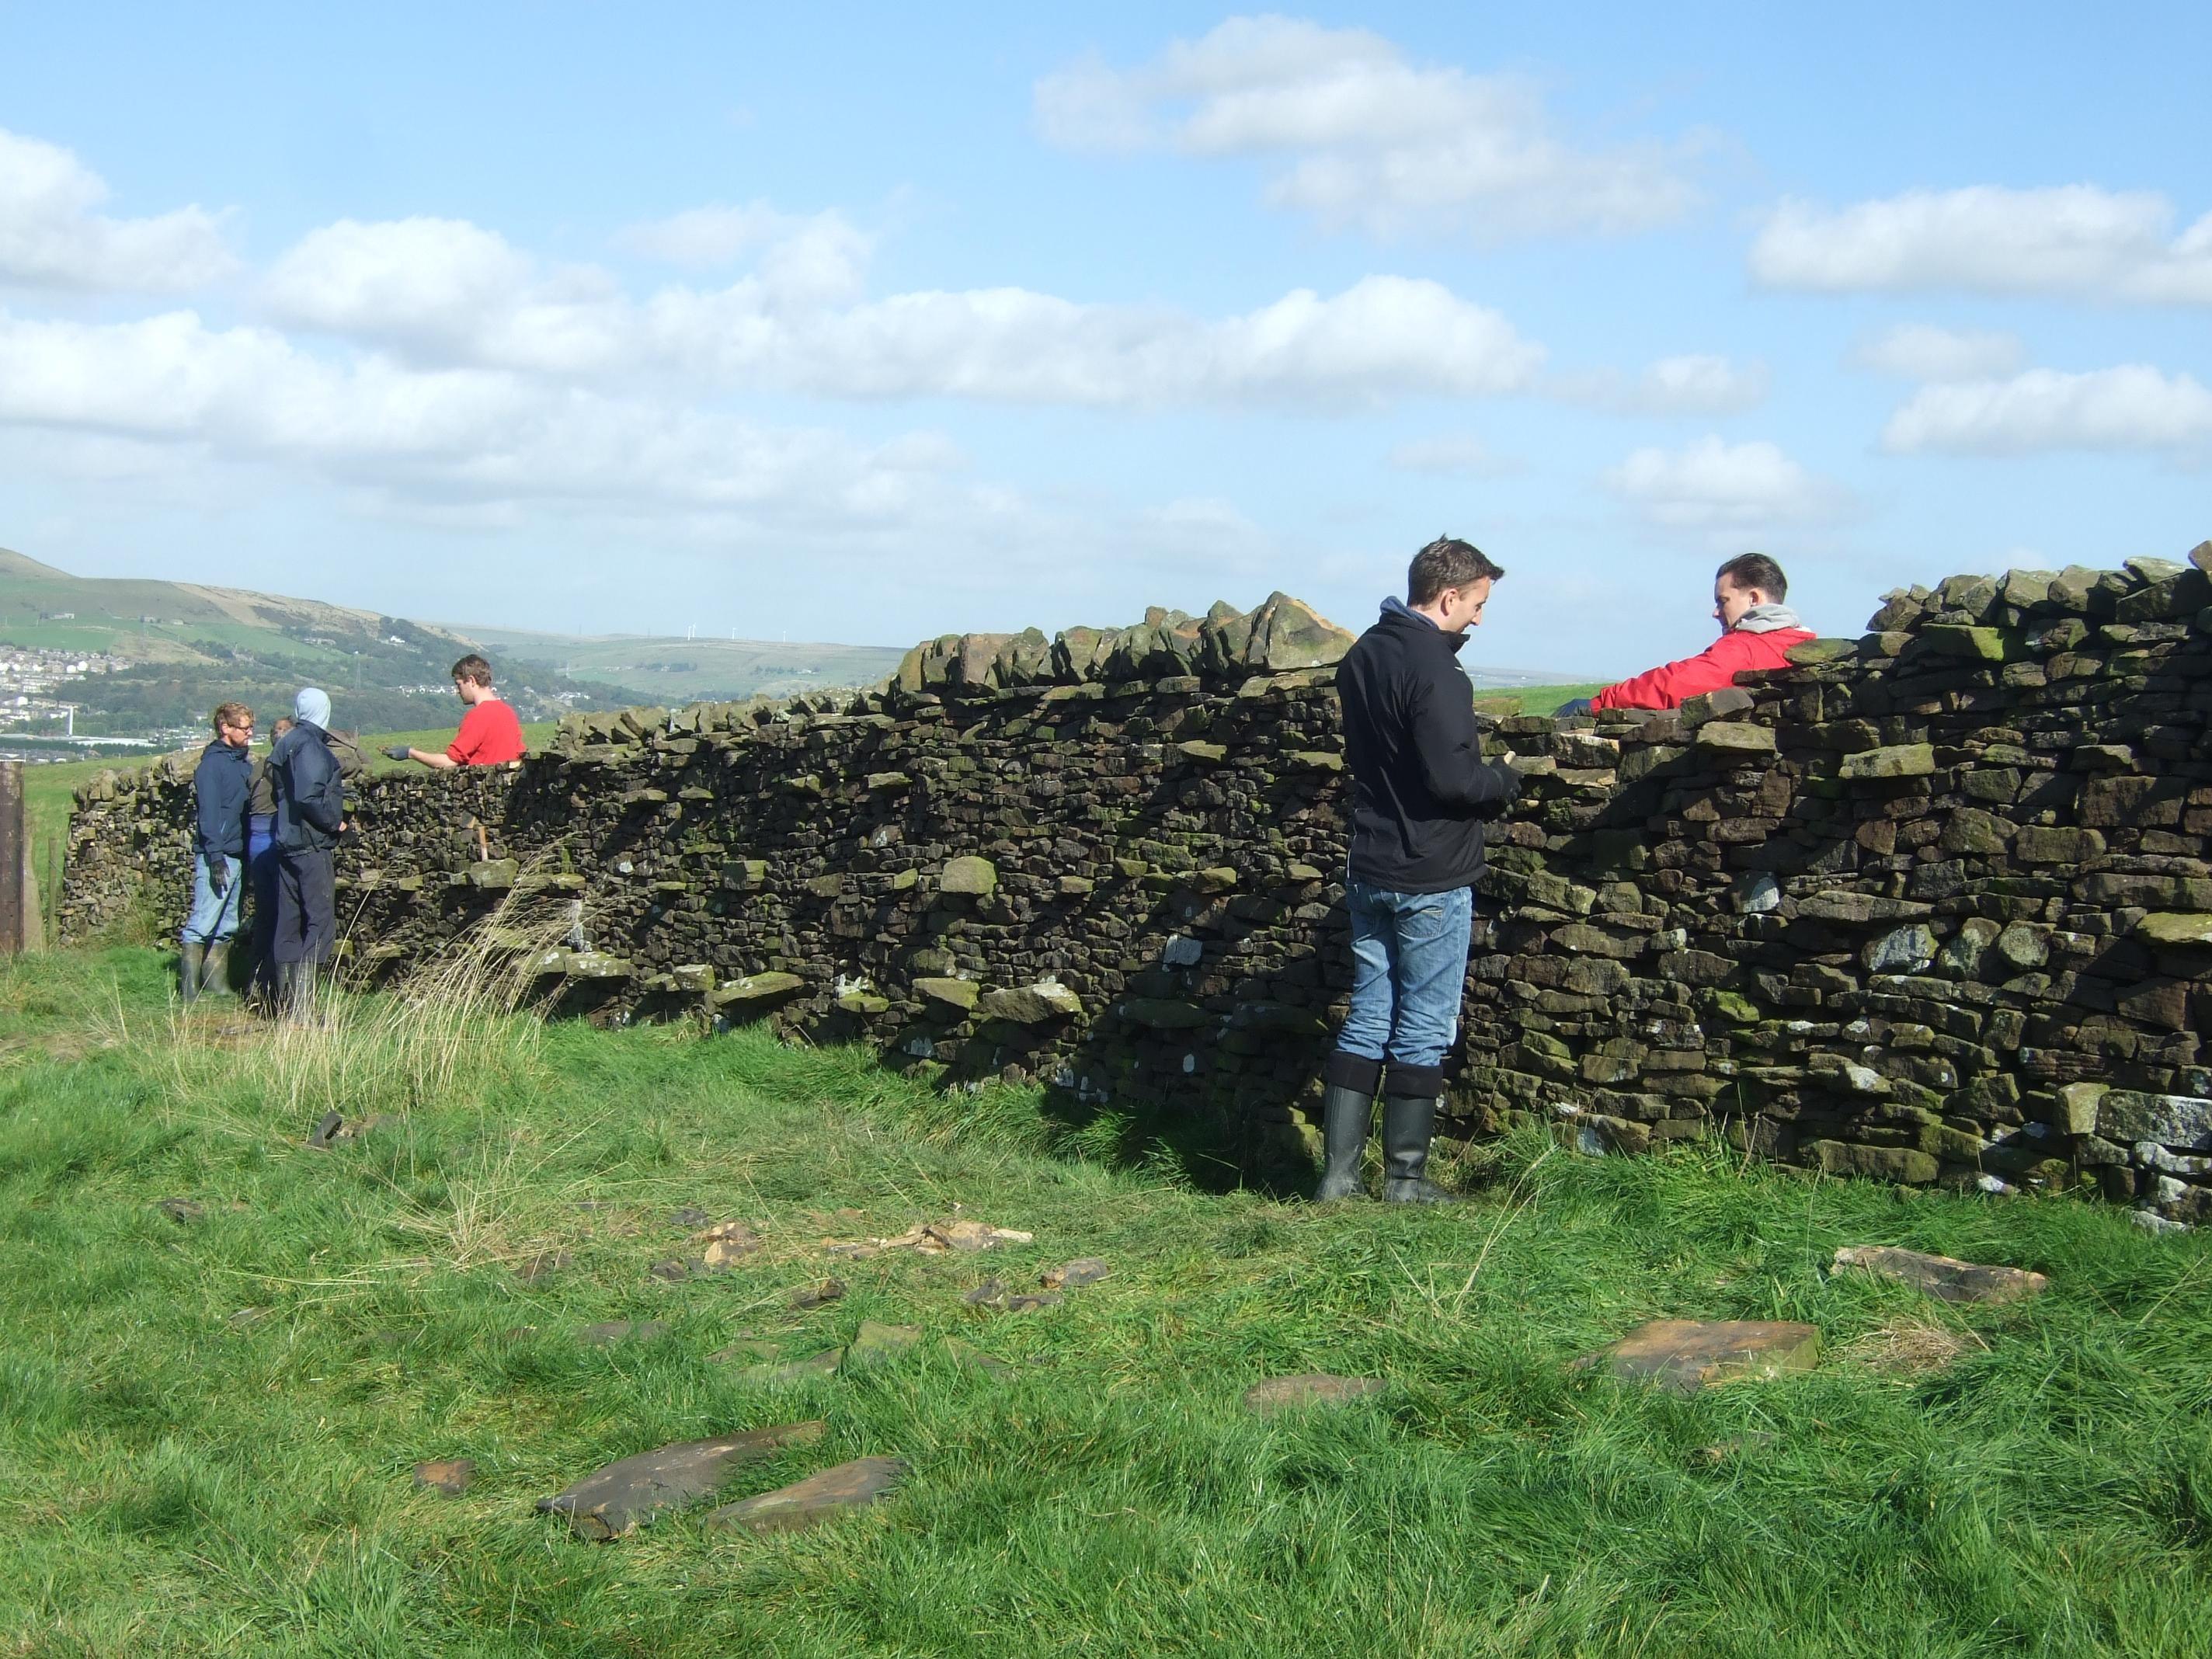 maintaining boundary lines